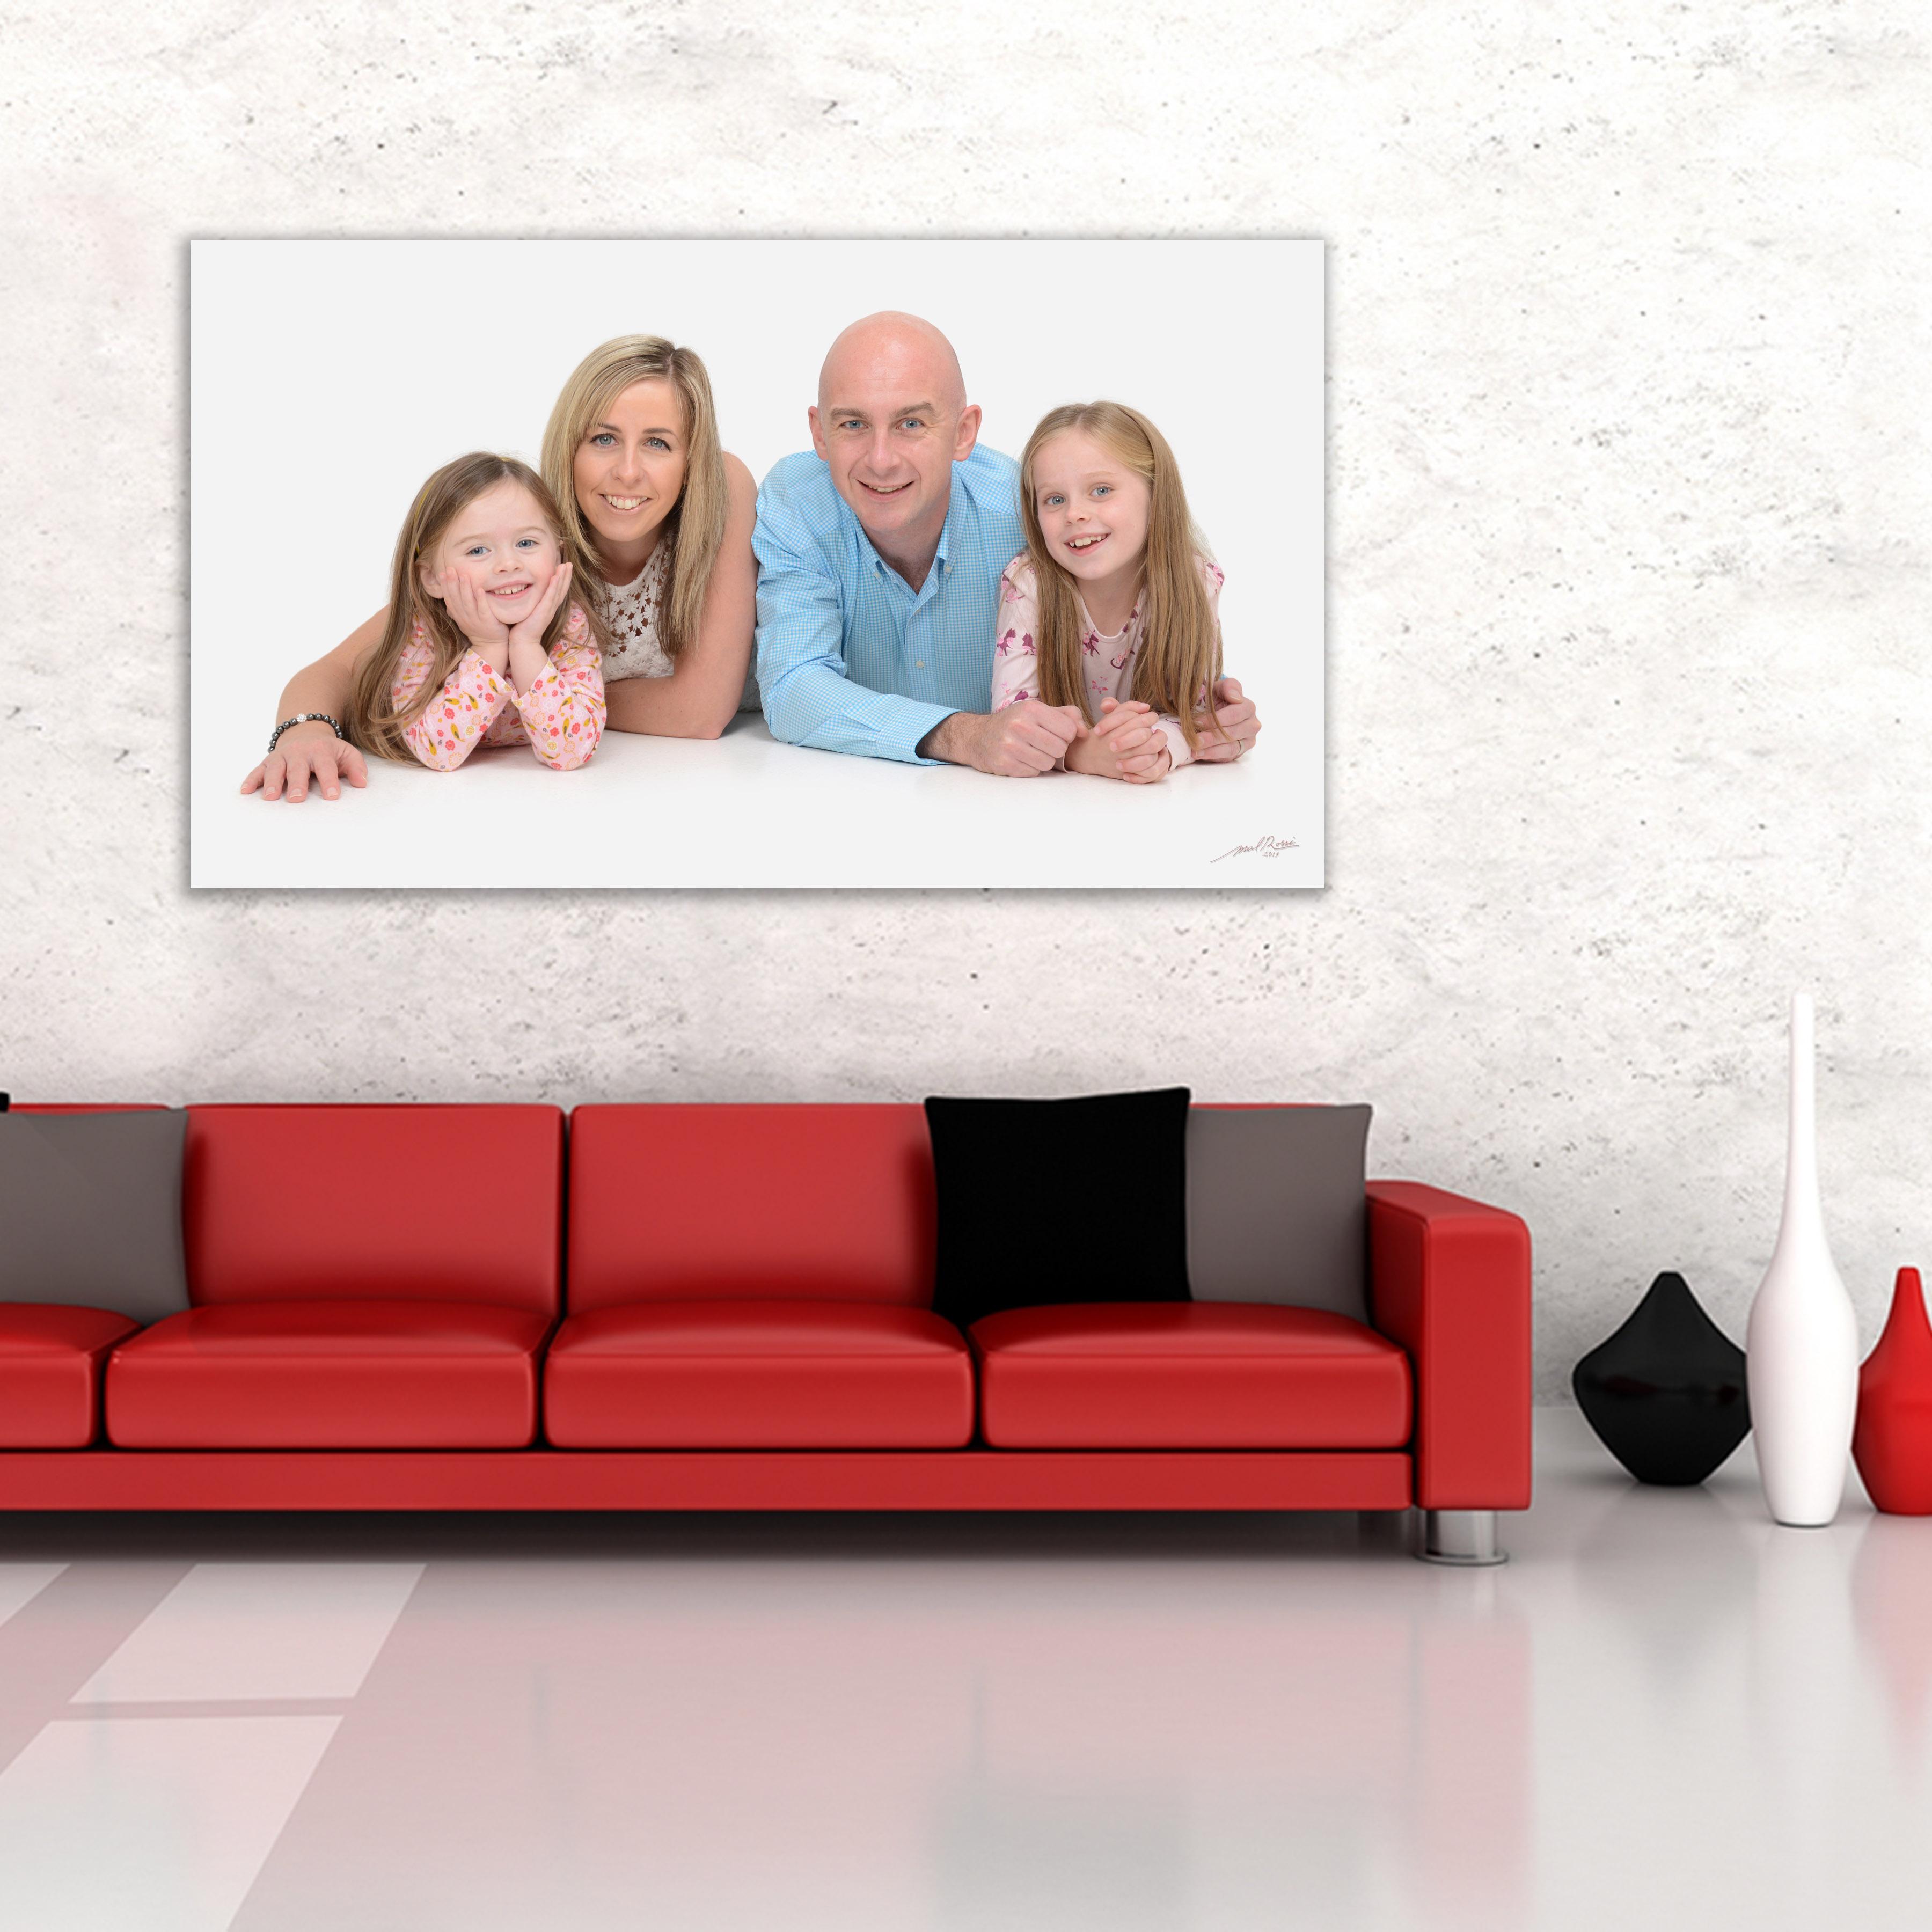 symetry-living-room-design-04